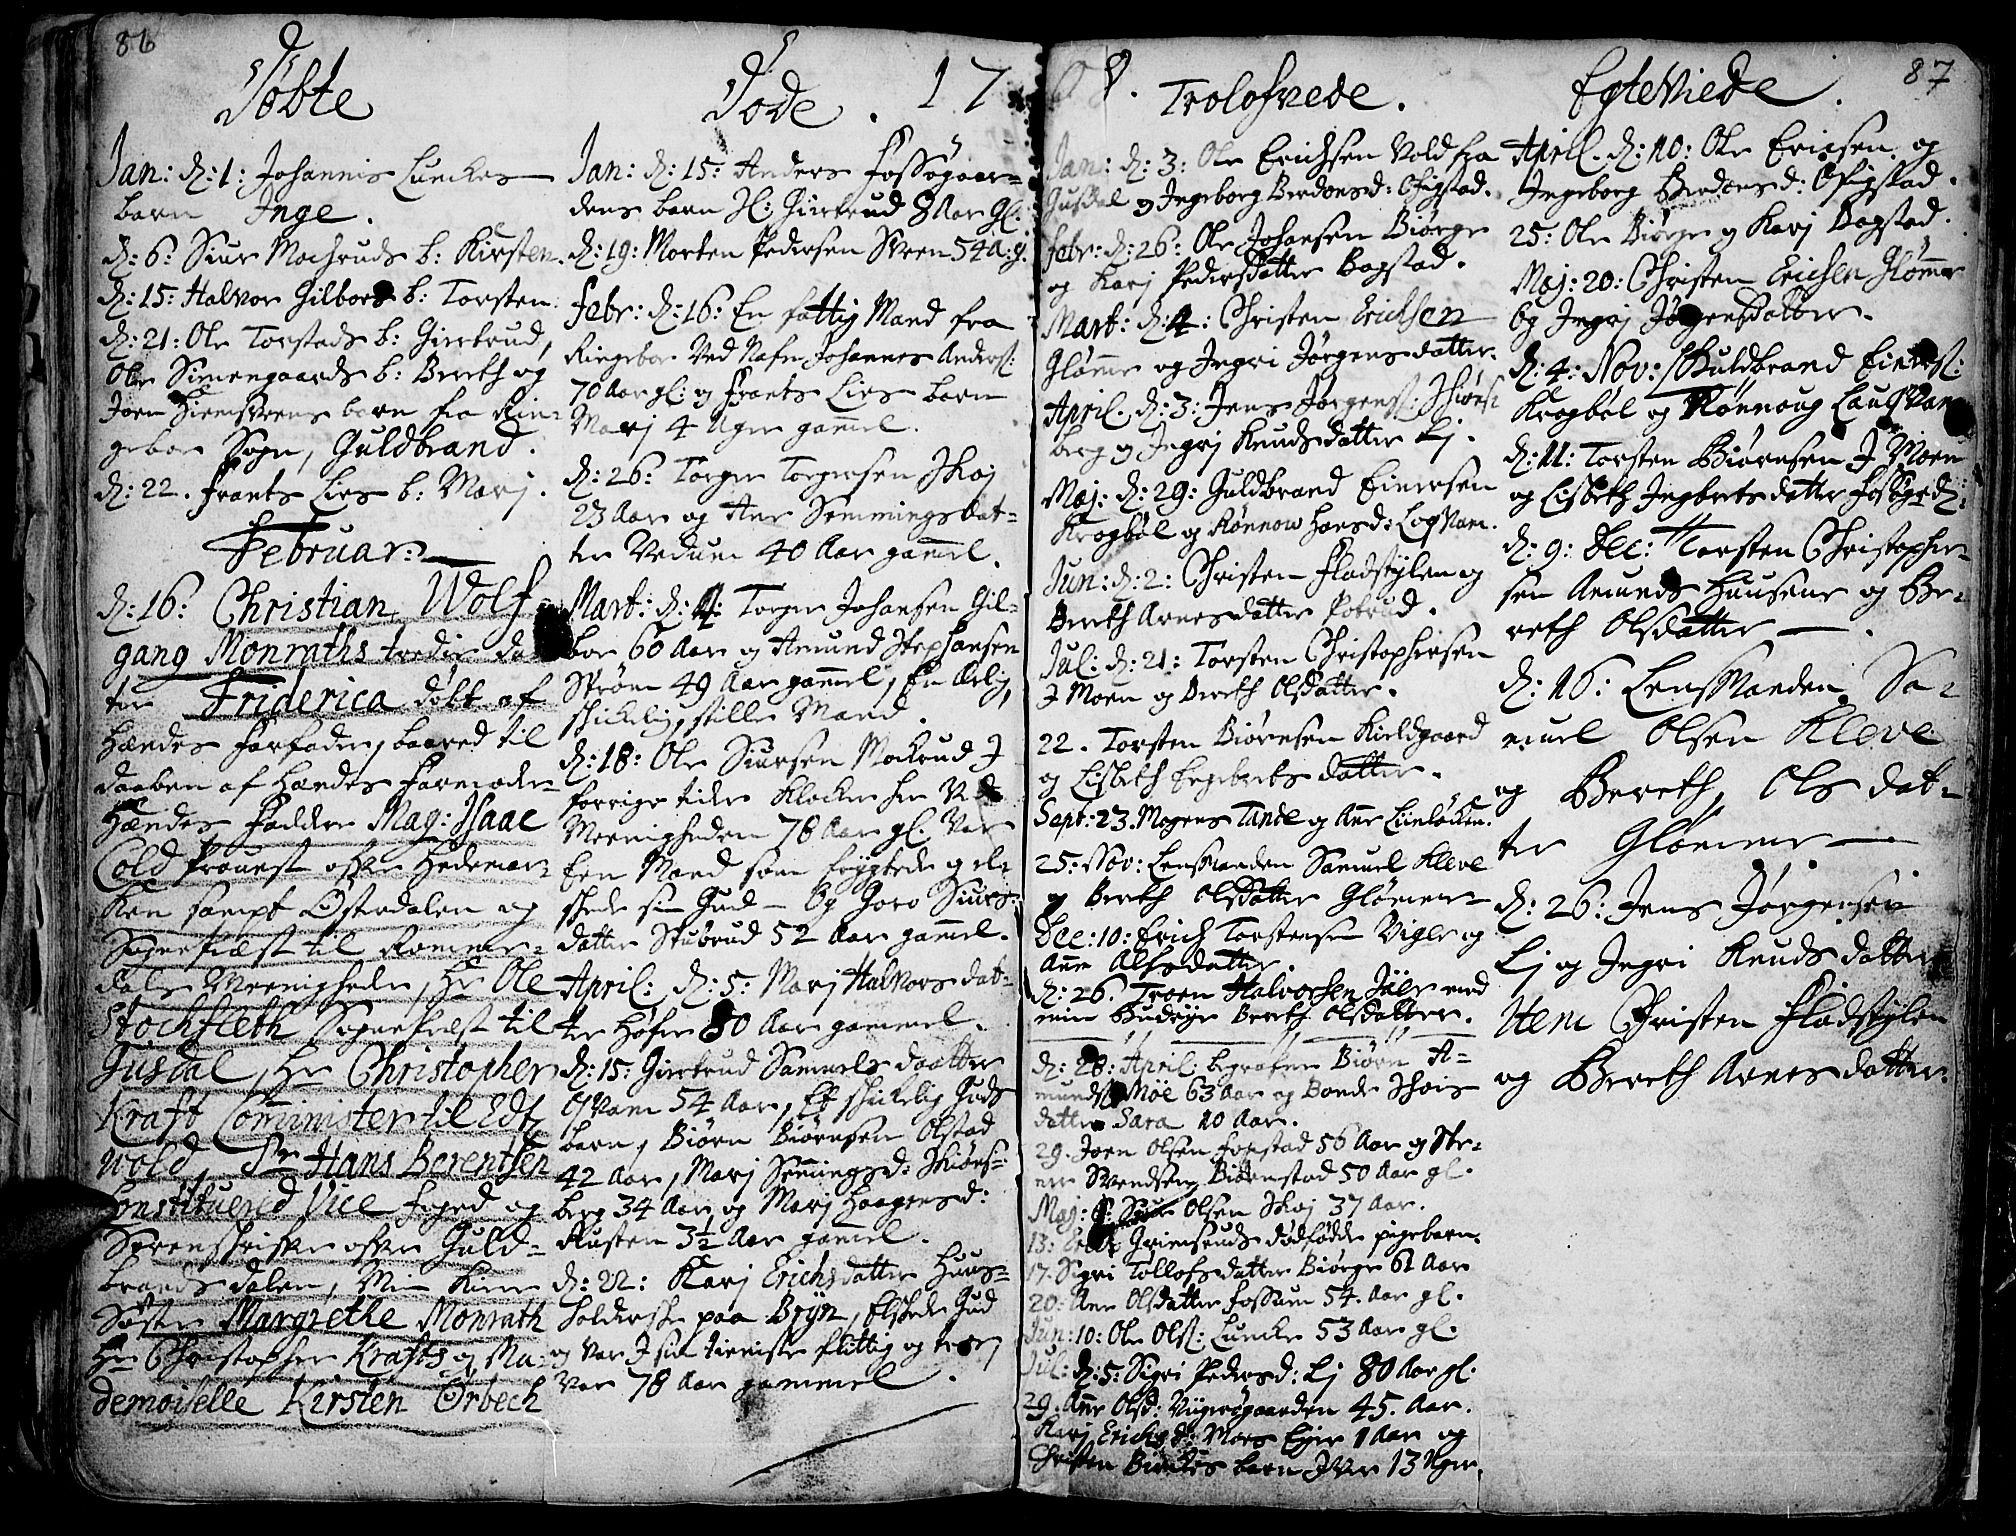 SAH, Øyer prestekontor, Ministerialbok nr. 1, 1671-1727, s. 86-87